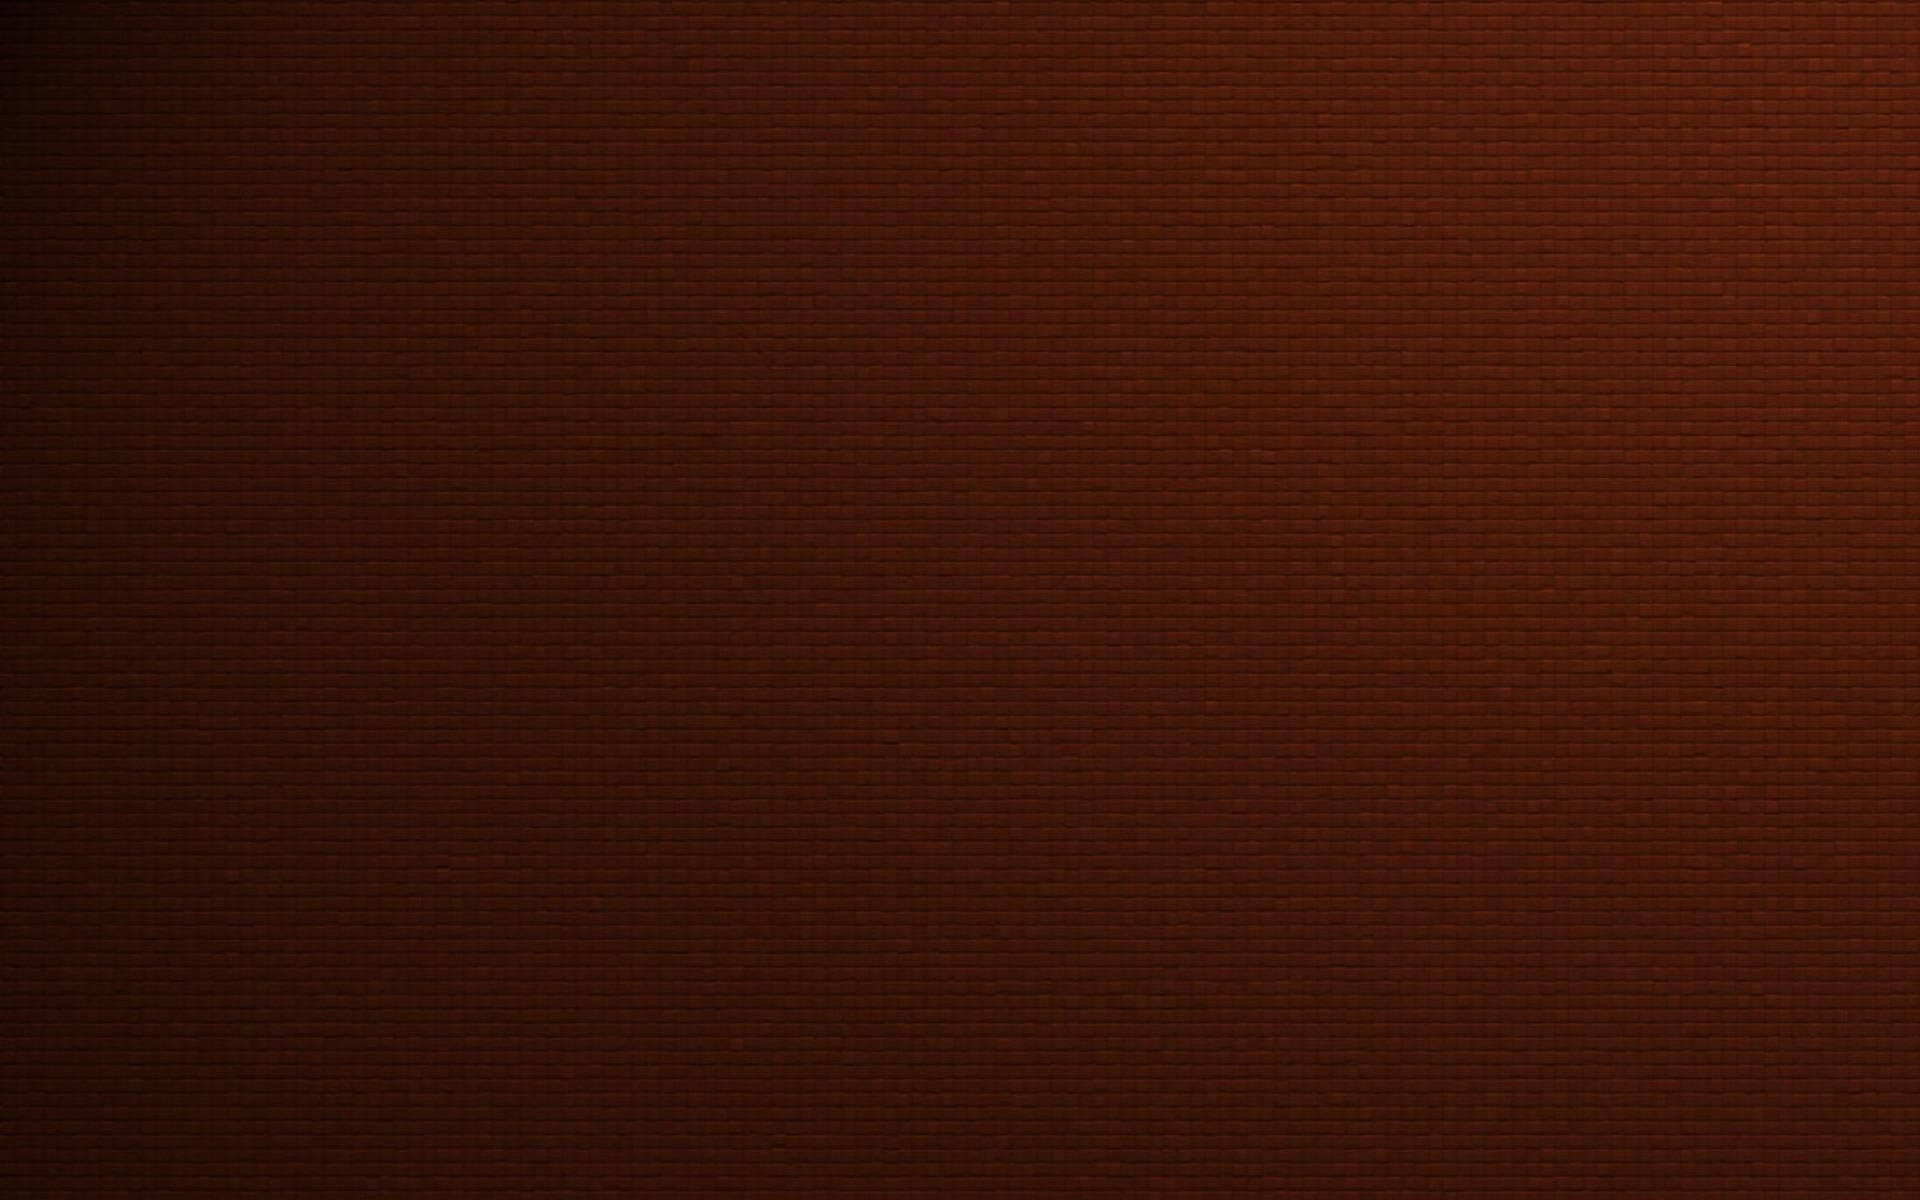 19201200 brown windows wallpaper an abstract brown pc wallpaper made 1920x1200